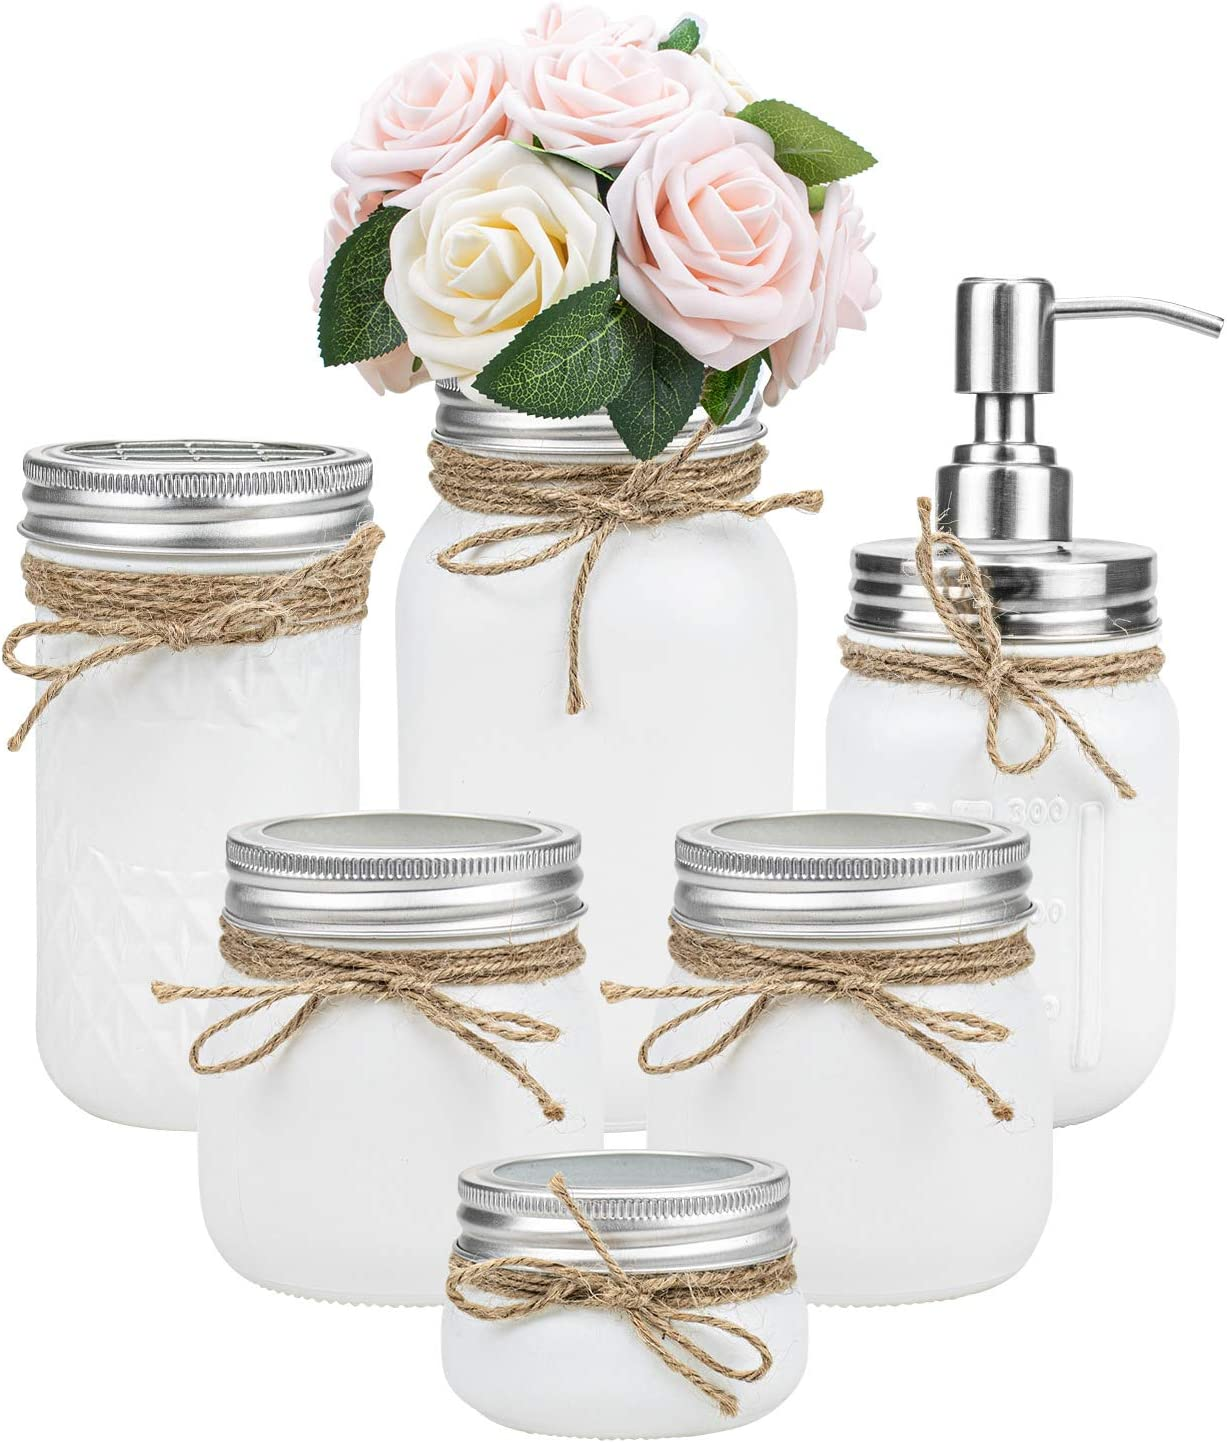 Tebery 6 Pack White Painted Mason Jar Bathroom Accessories Set Rustic Farmhouse Decor Bathroom Countertop Vanity Organizer